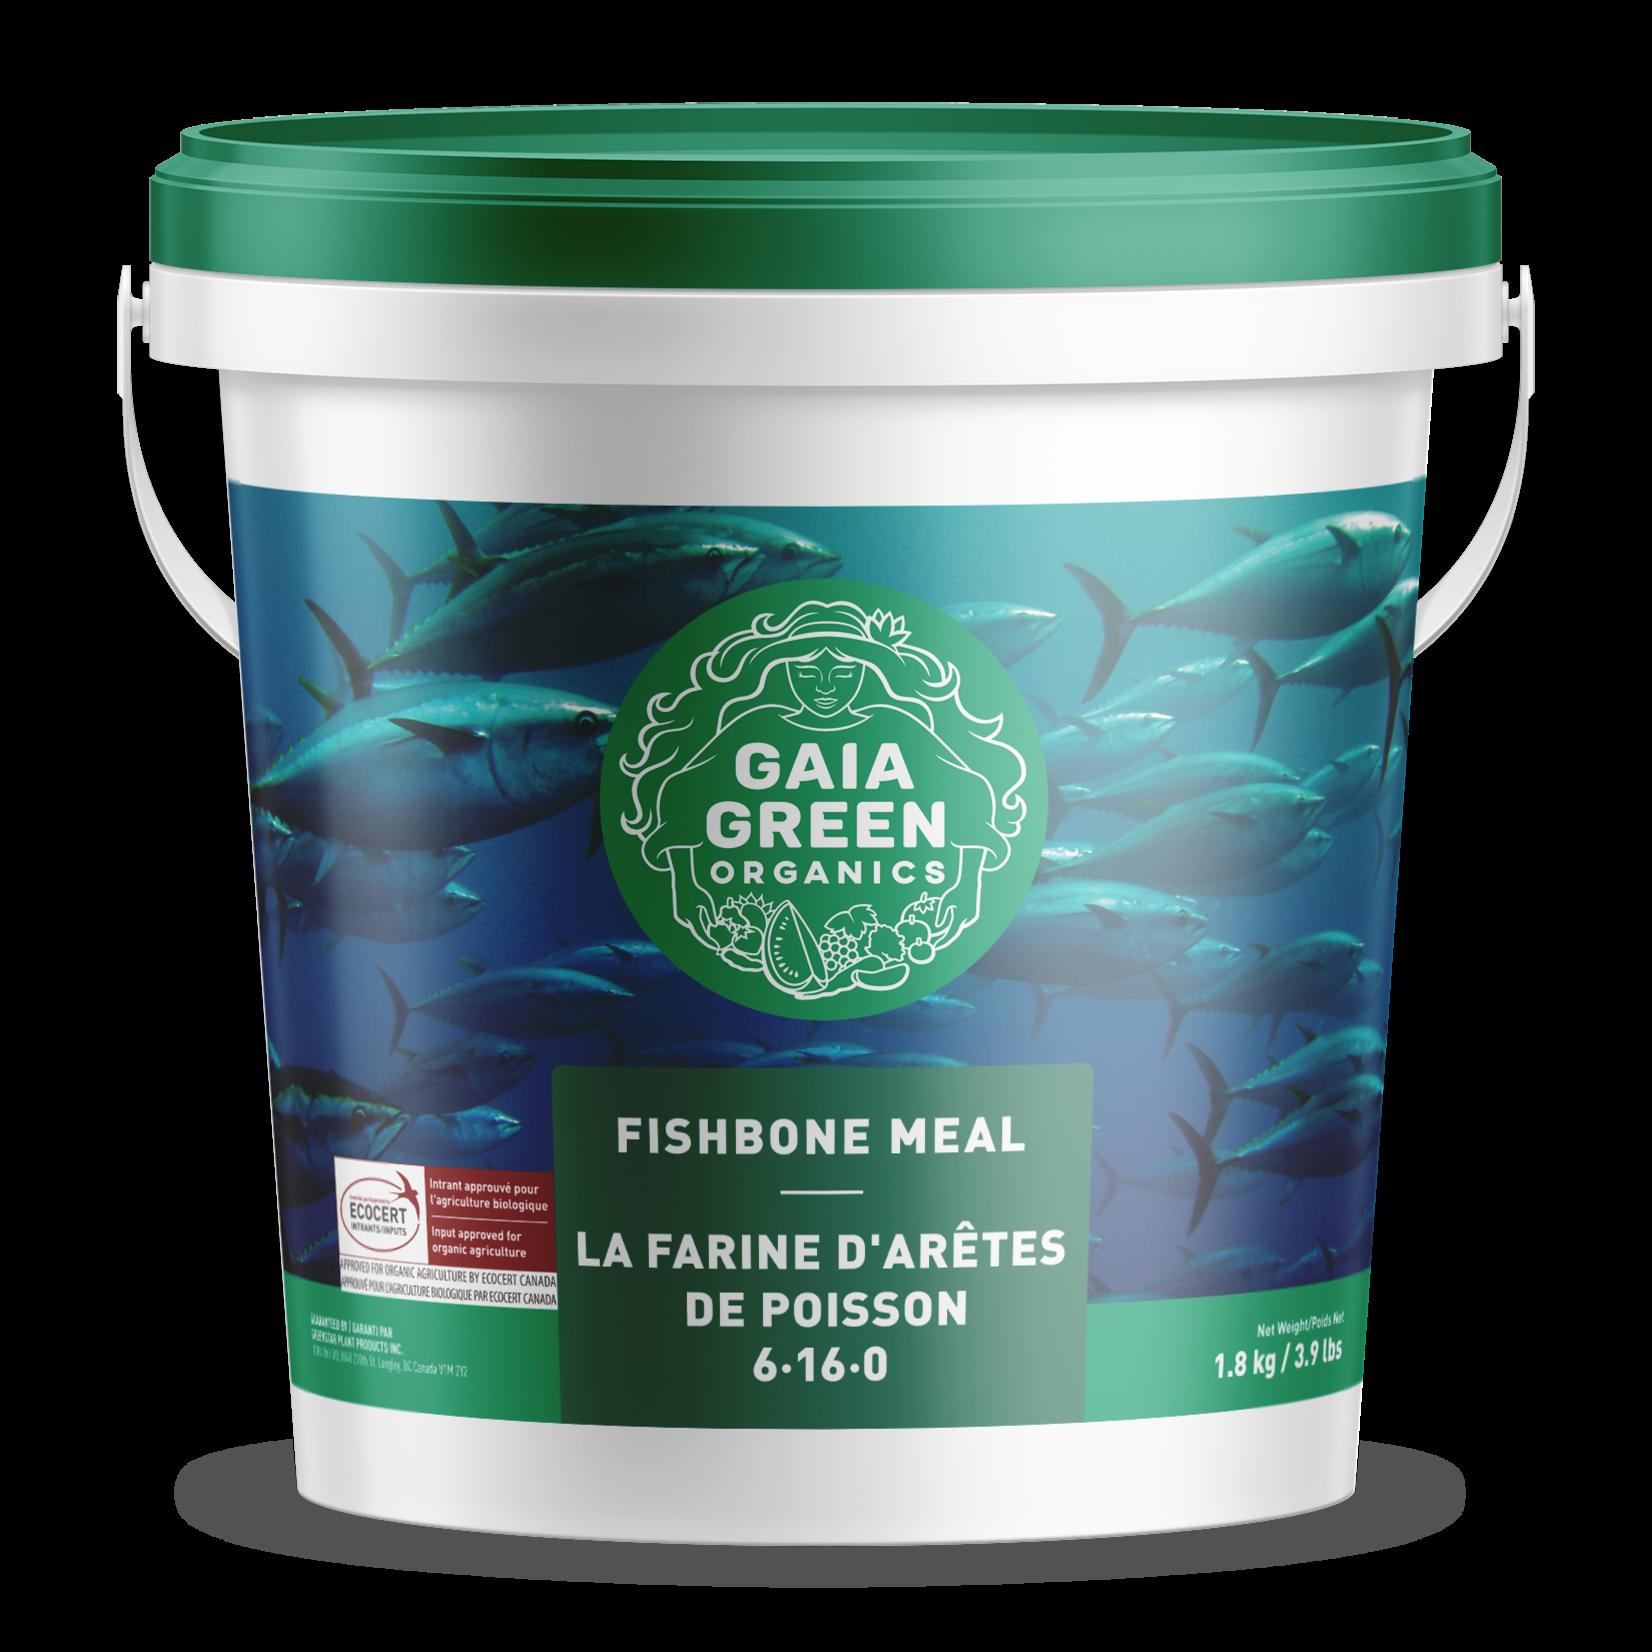 gaia green Gaia Green FISH BONE MEAL 1.8KG